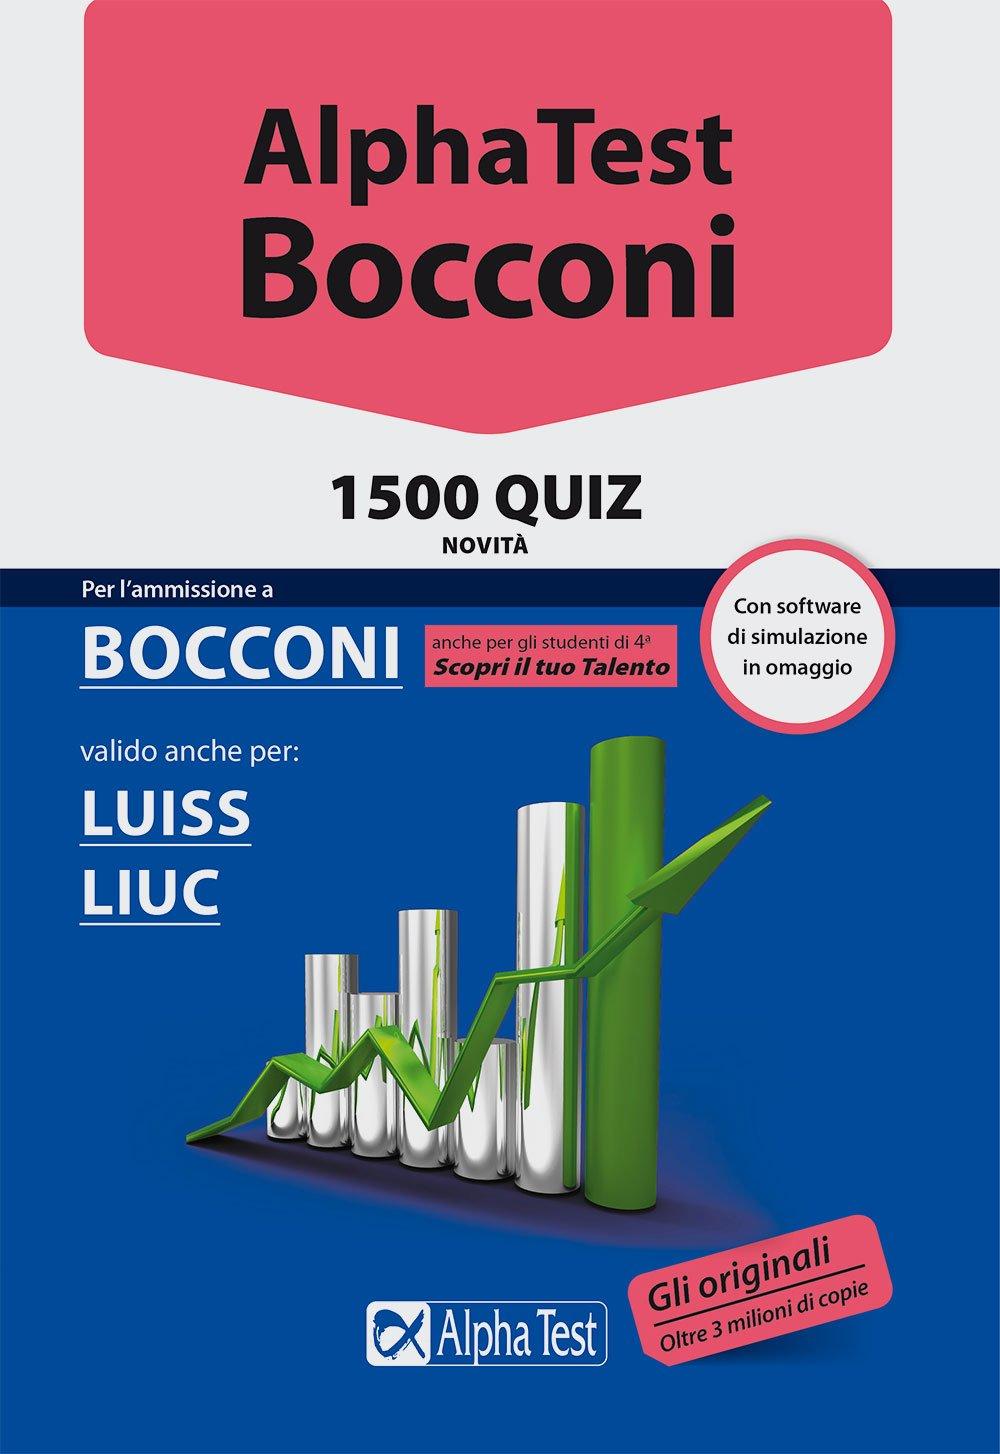 ALPHA TEST Bocconi Luiss Liuc 1500 QUIZ